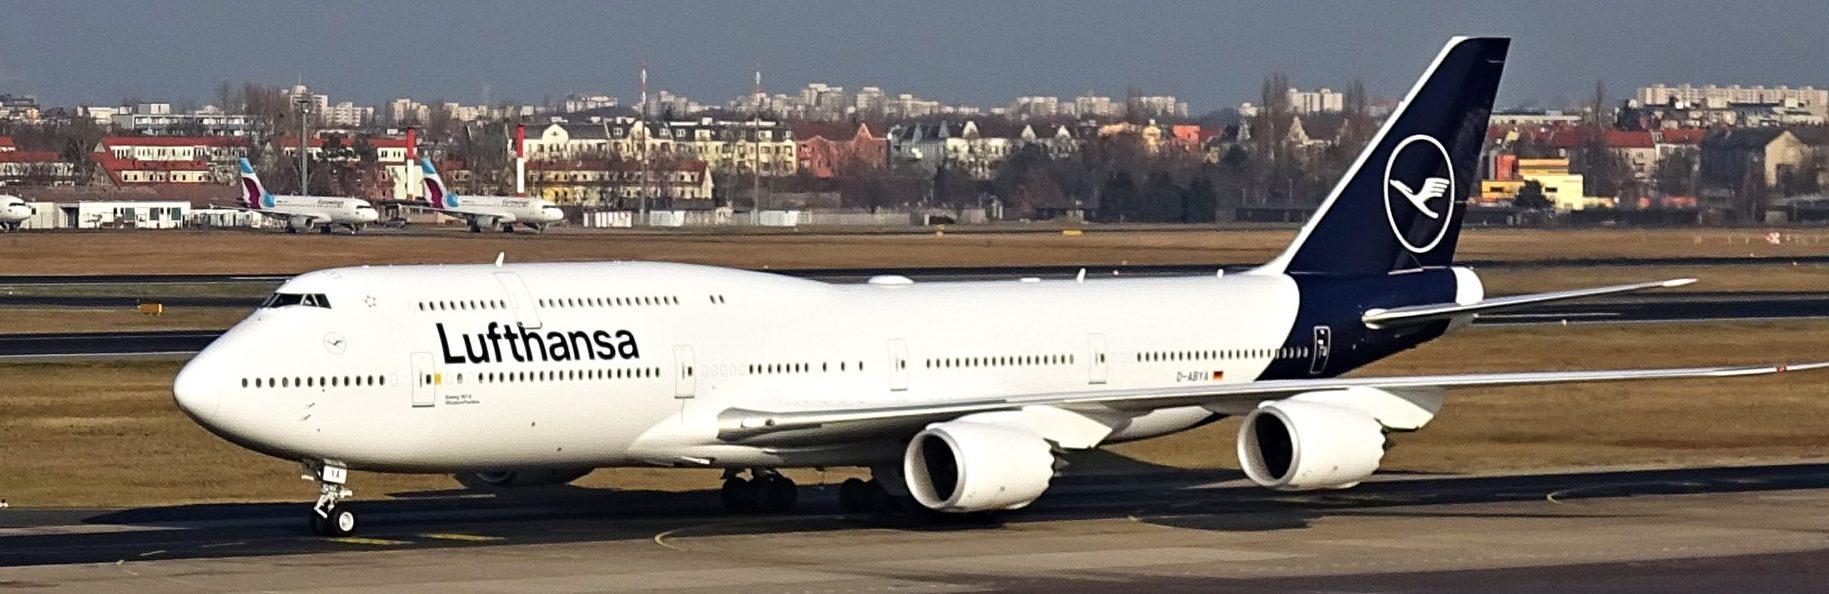 Lufthansa livery 2018 B747-8